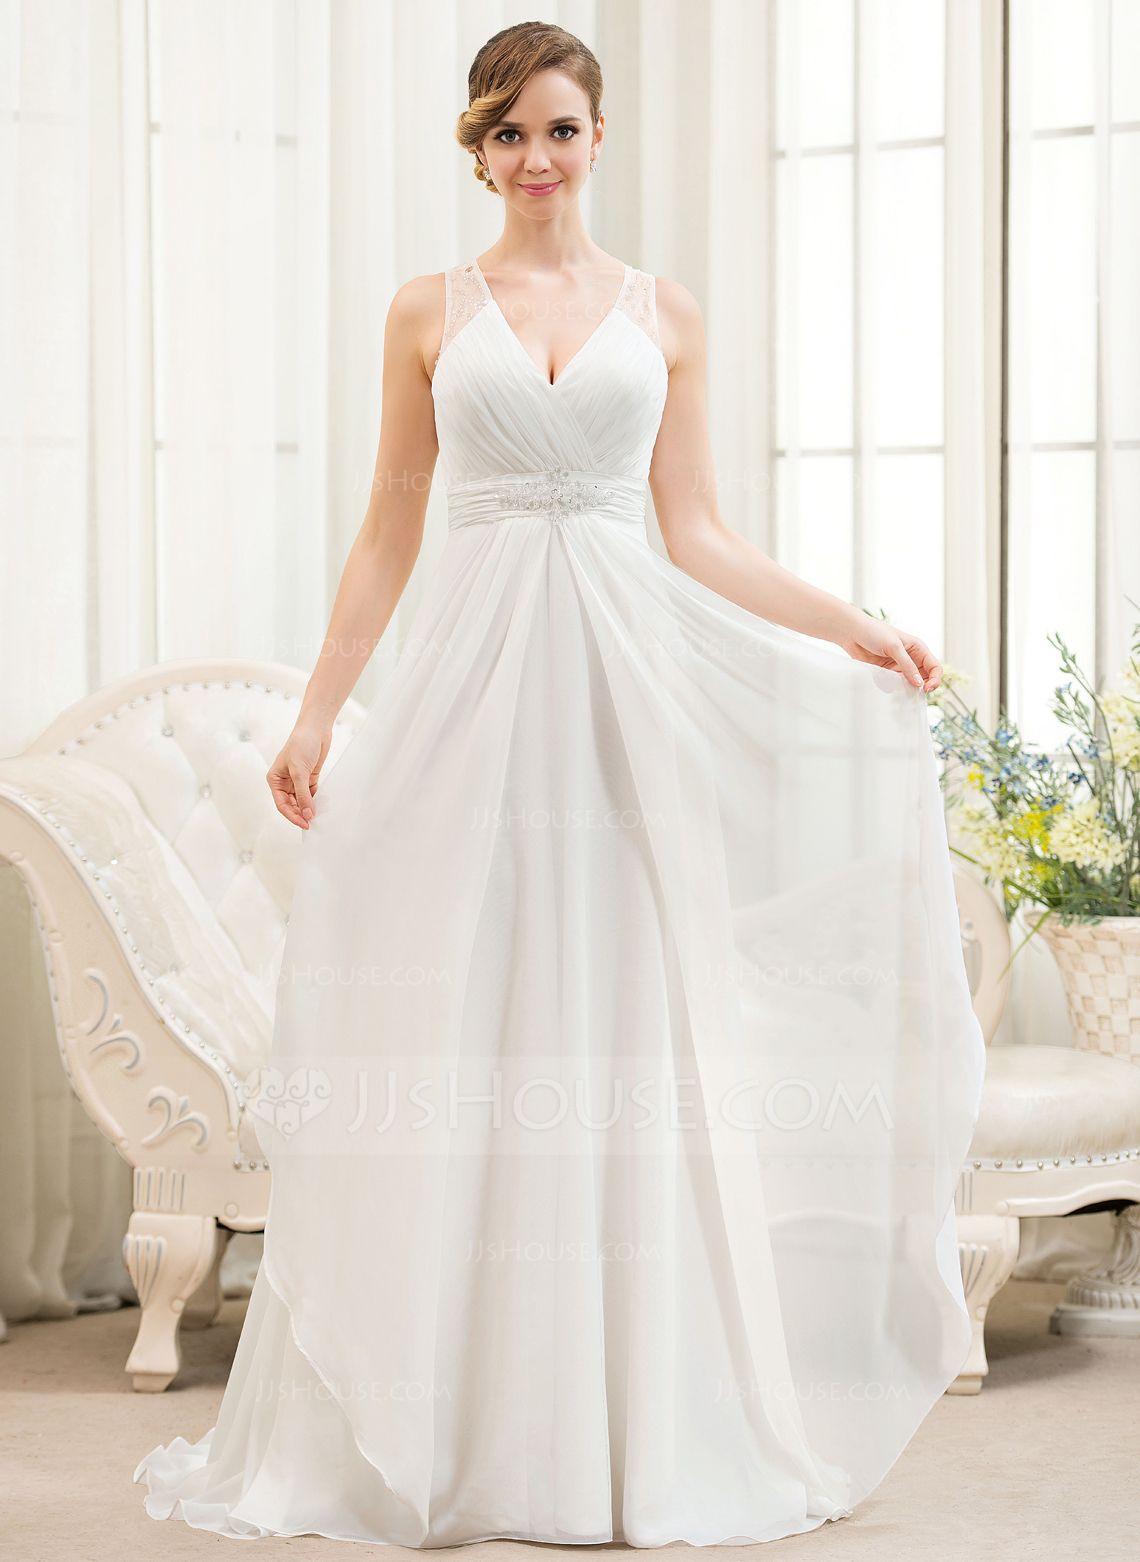 Dress for party wedding  ALinePrincess Vneck Sweep Train Chiffon Wedding Dress With